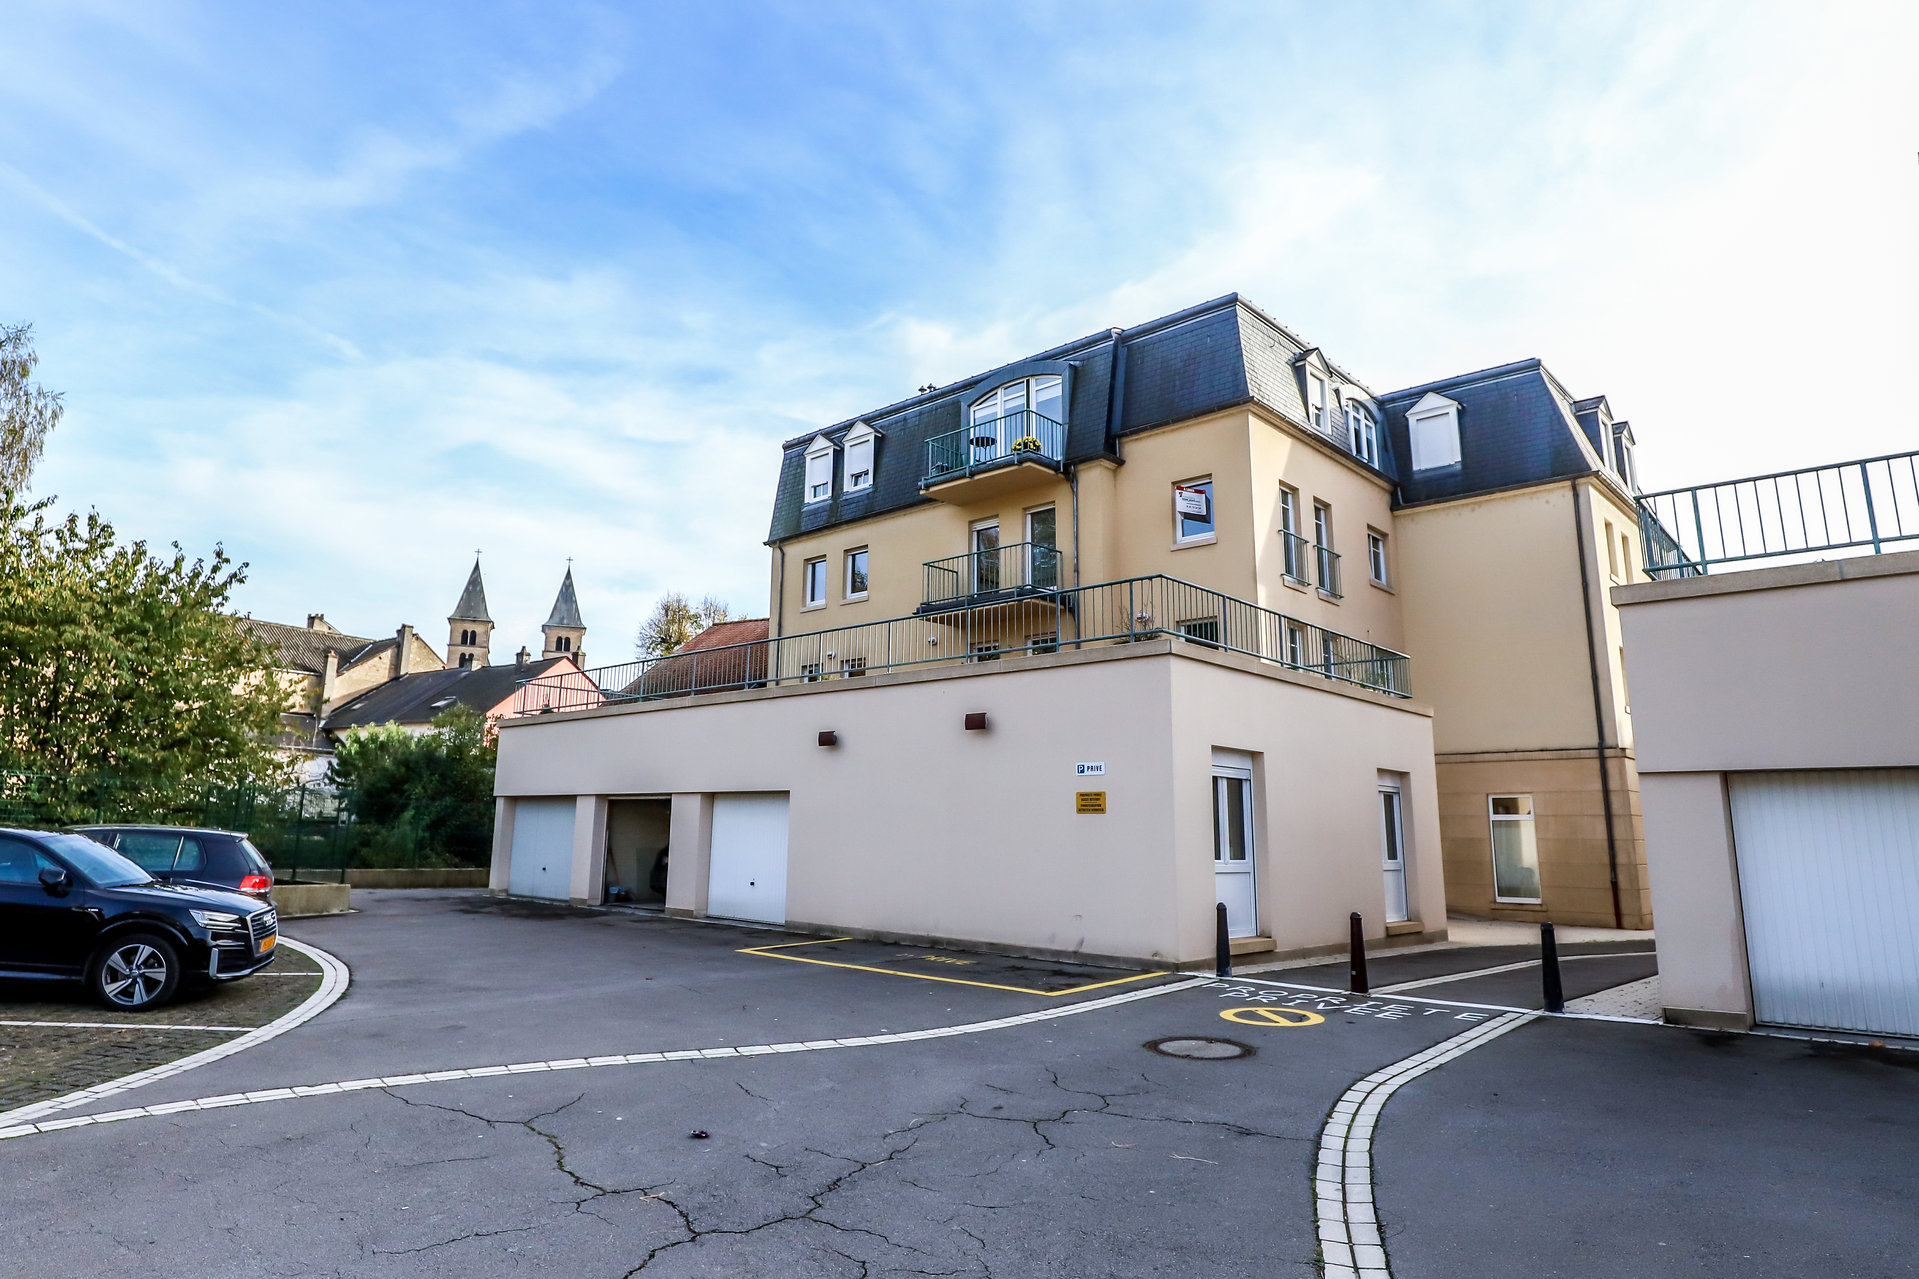 FOR RENT - apartment with 1 bedroom in Echternach